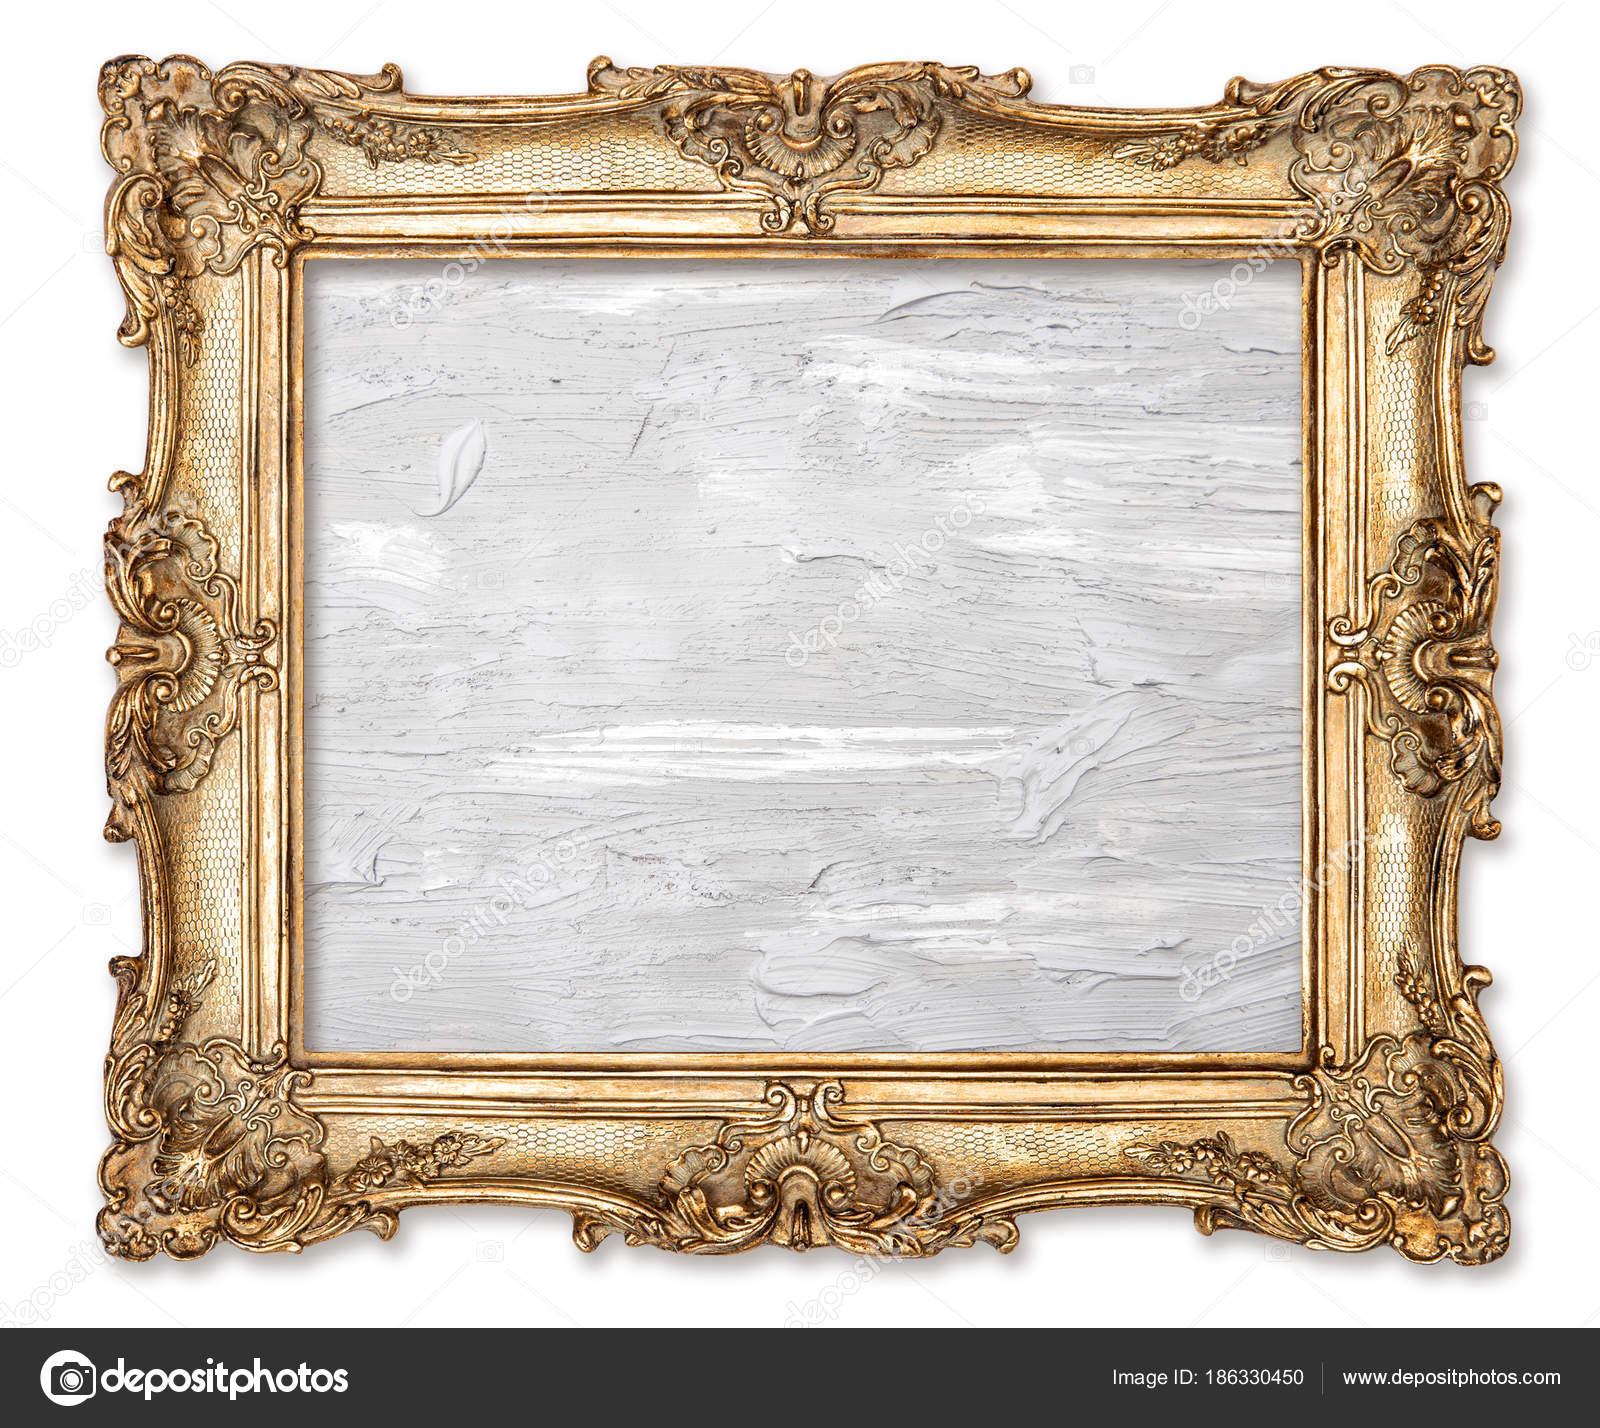 Aceite de marco de oro cuadro pintado lienzo blanco fondo — Fotos de ...